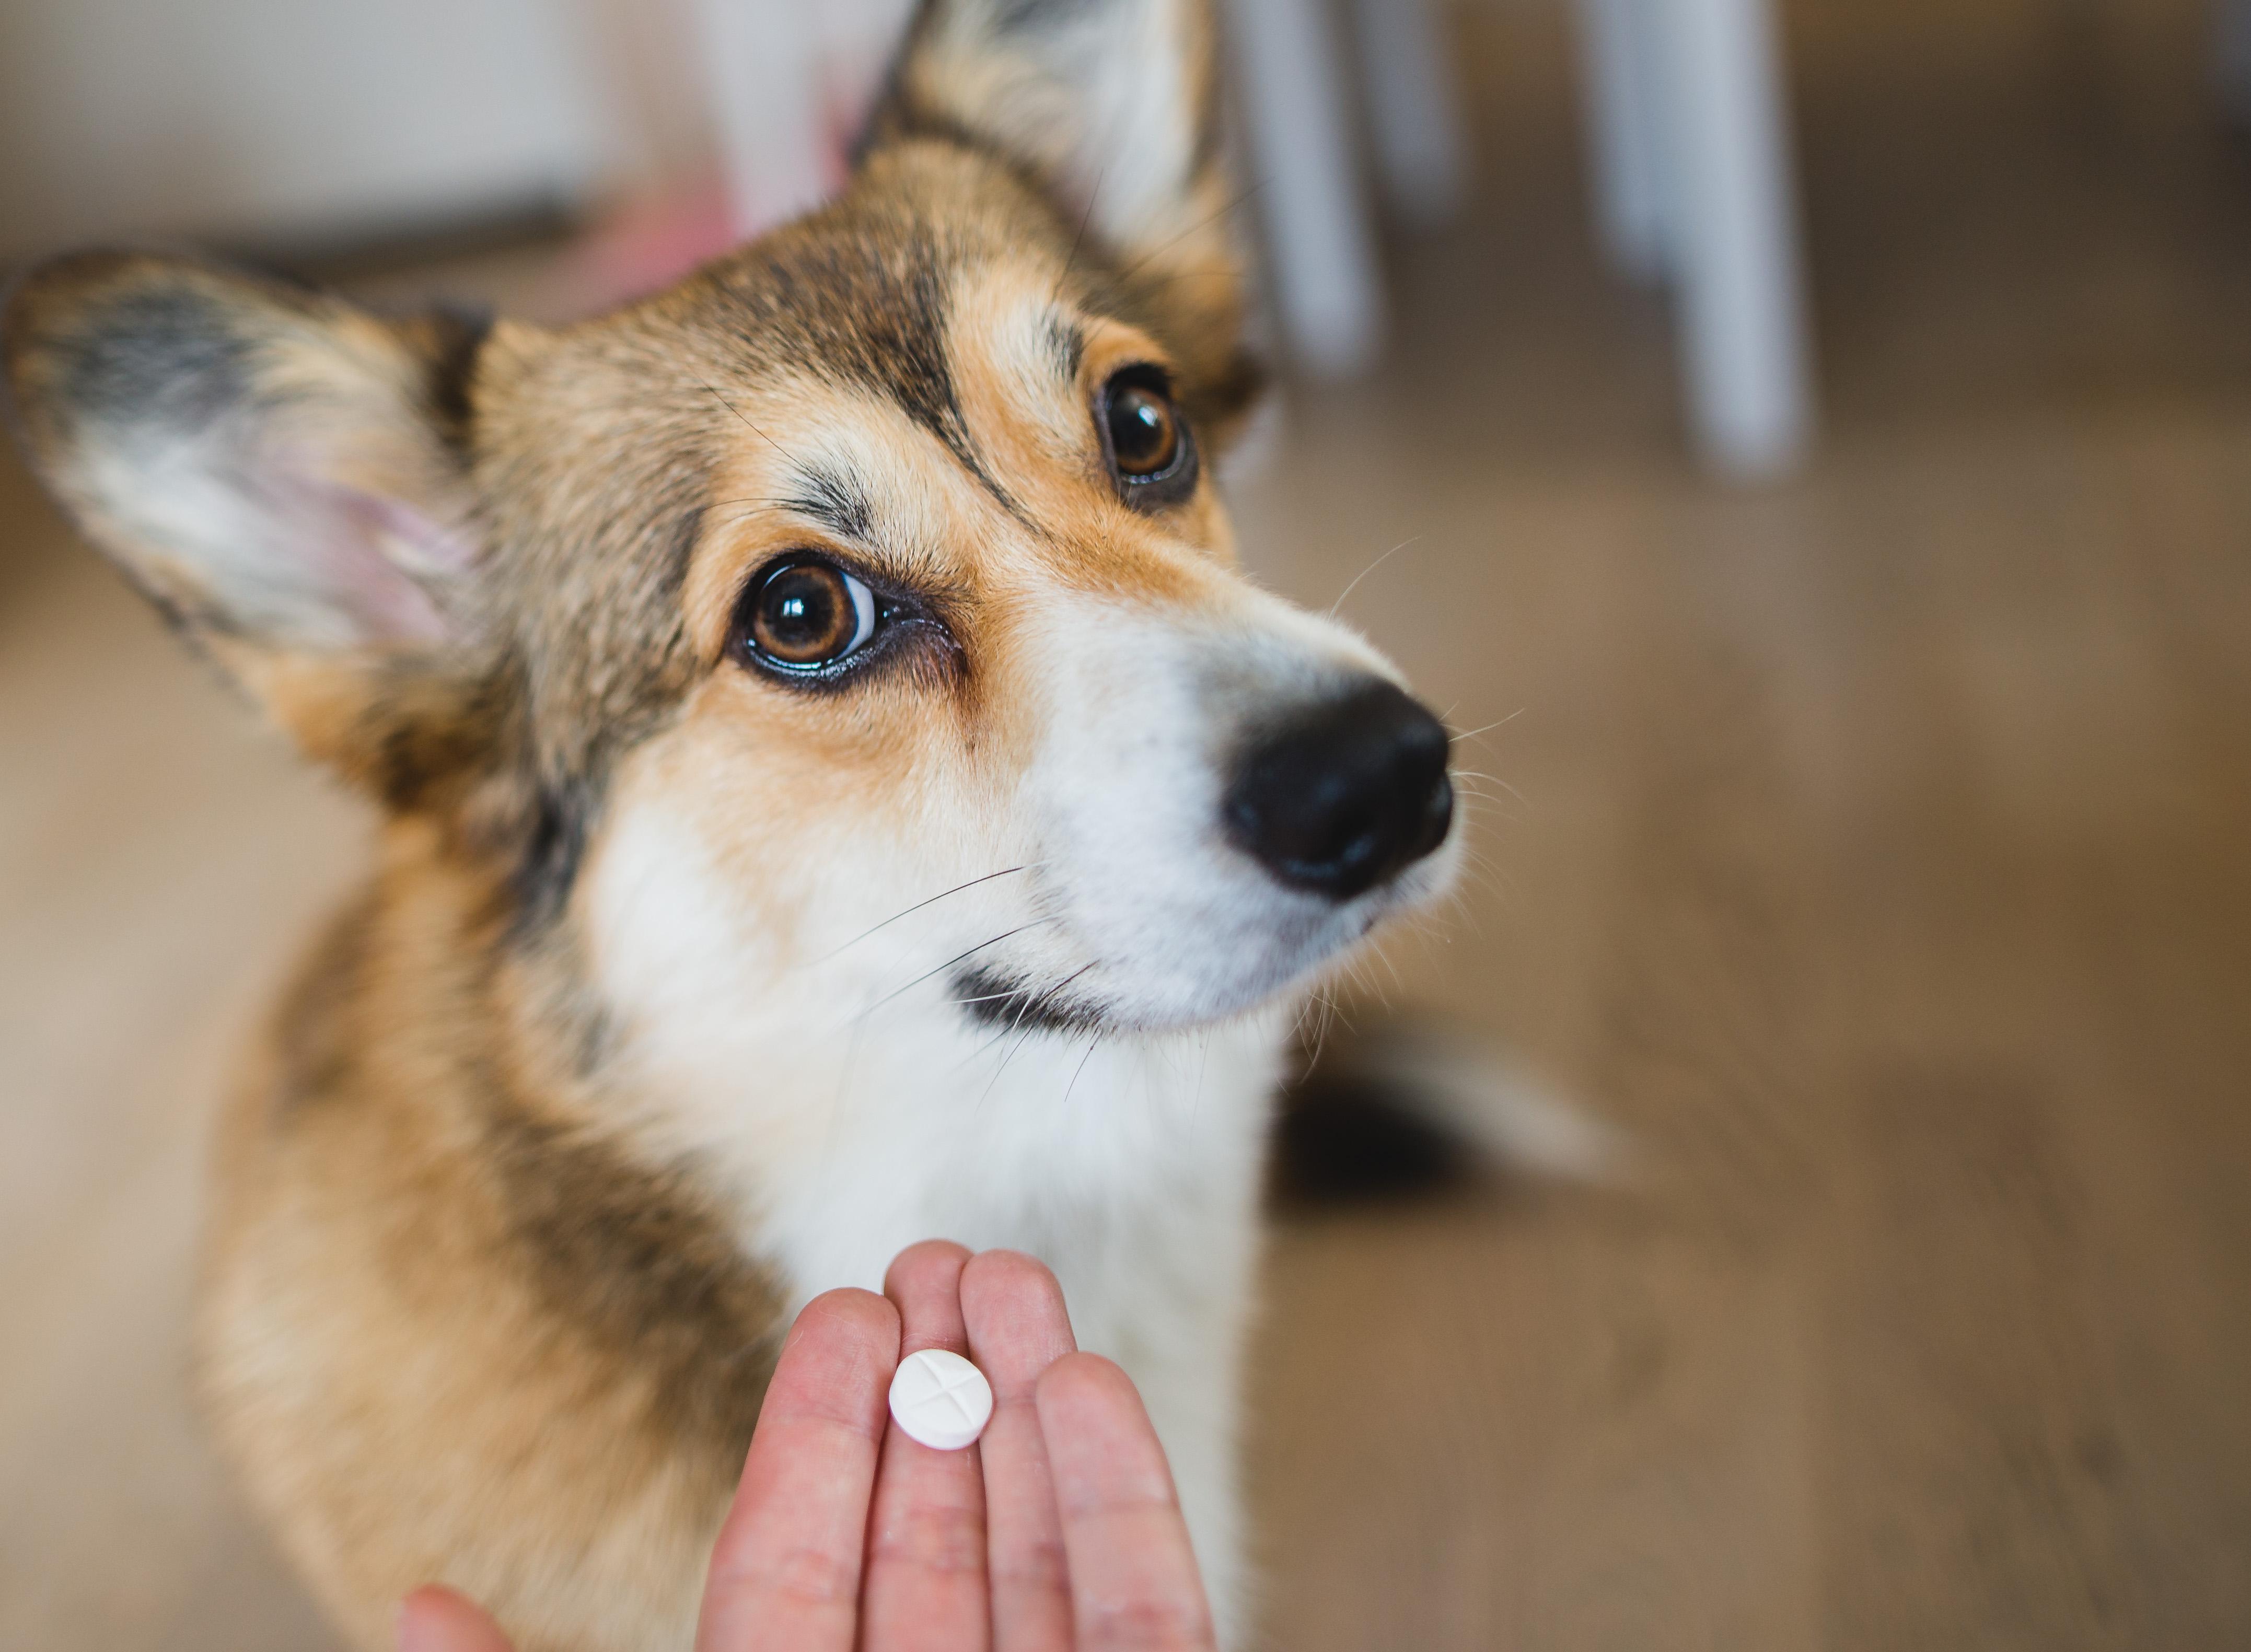 Dog and Trazodone Medication